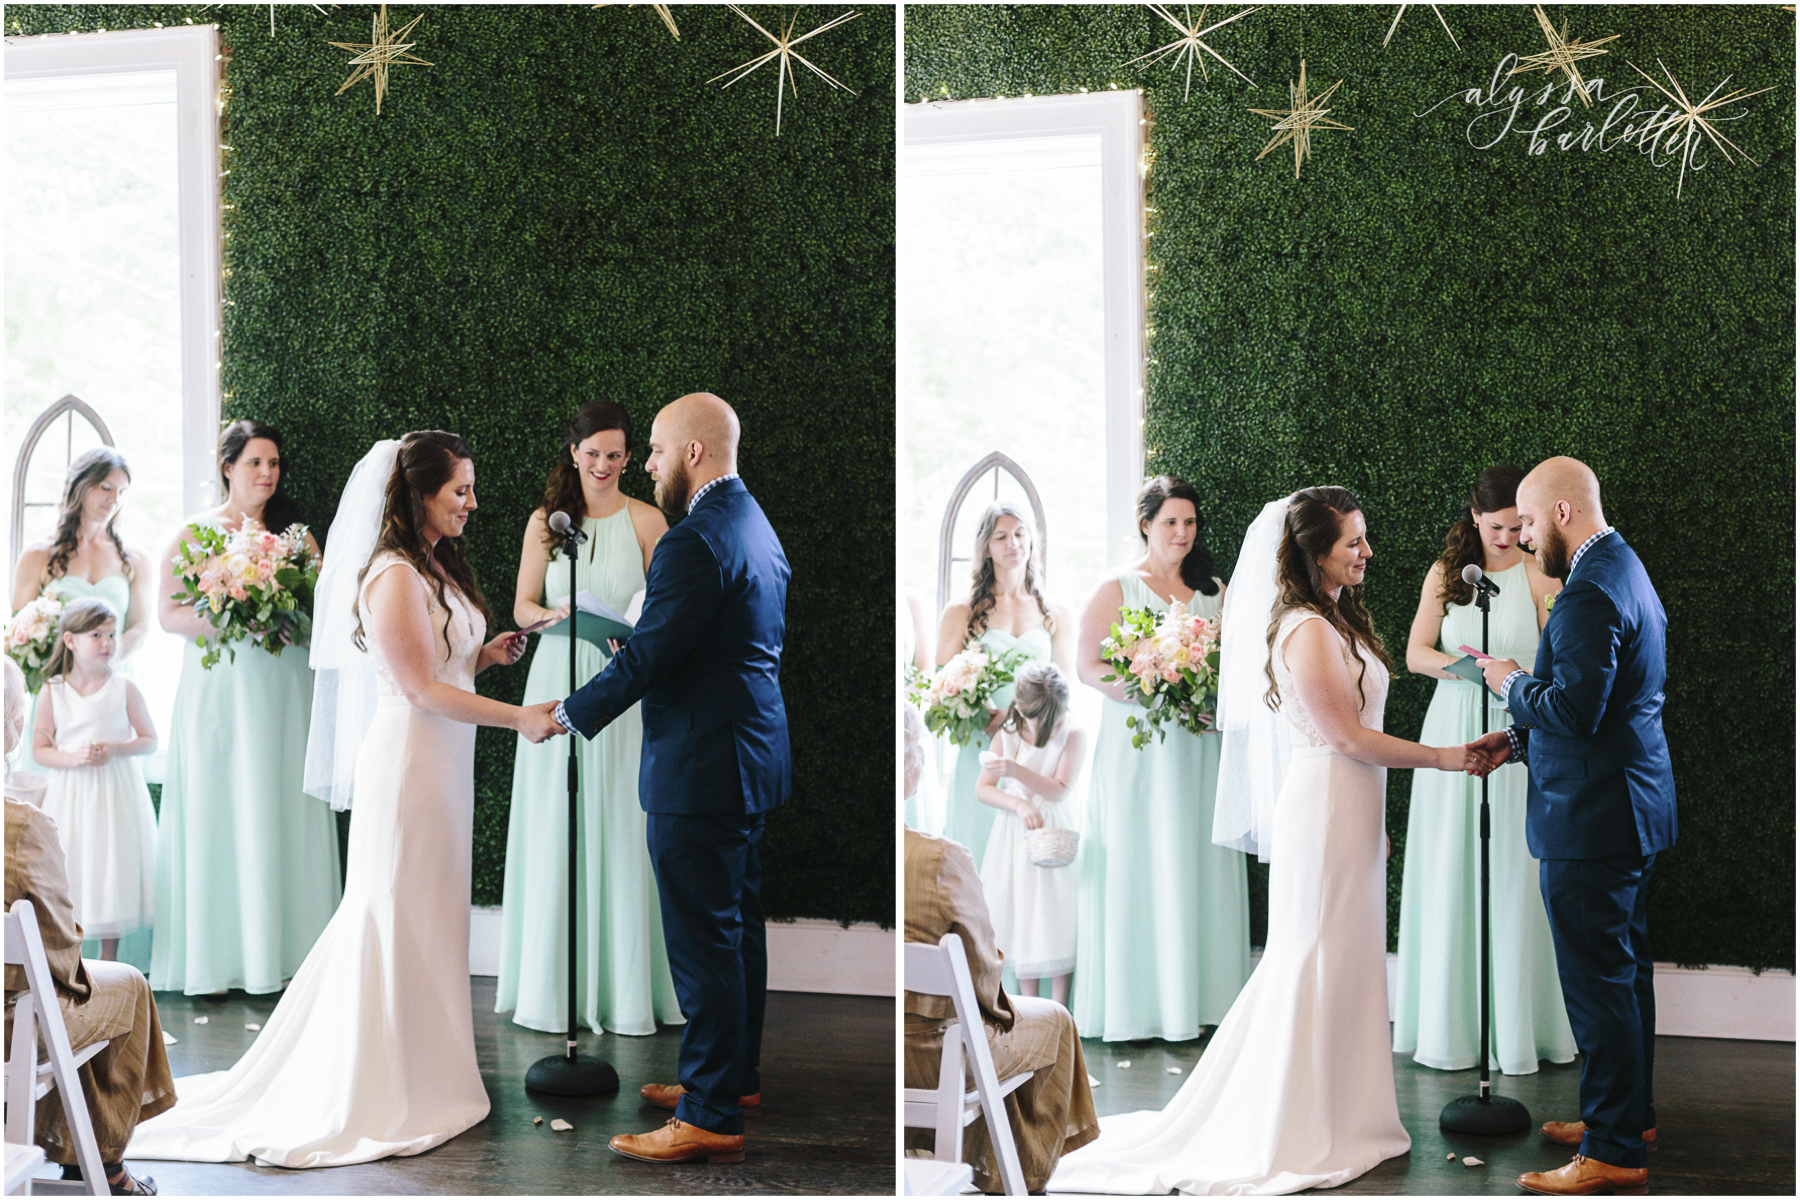 alyssa barletter photography kansas city wedding 2016 main courtney and brian-1-19.jpg